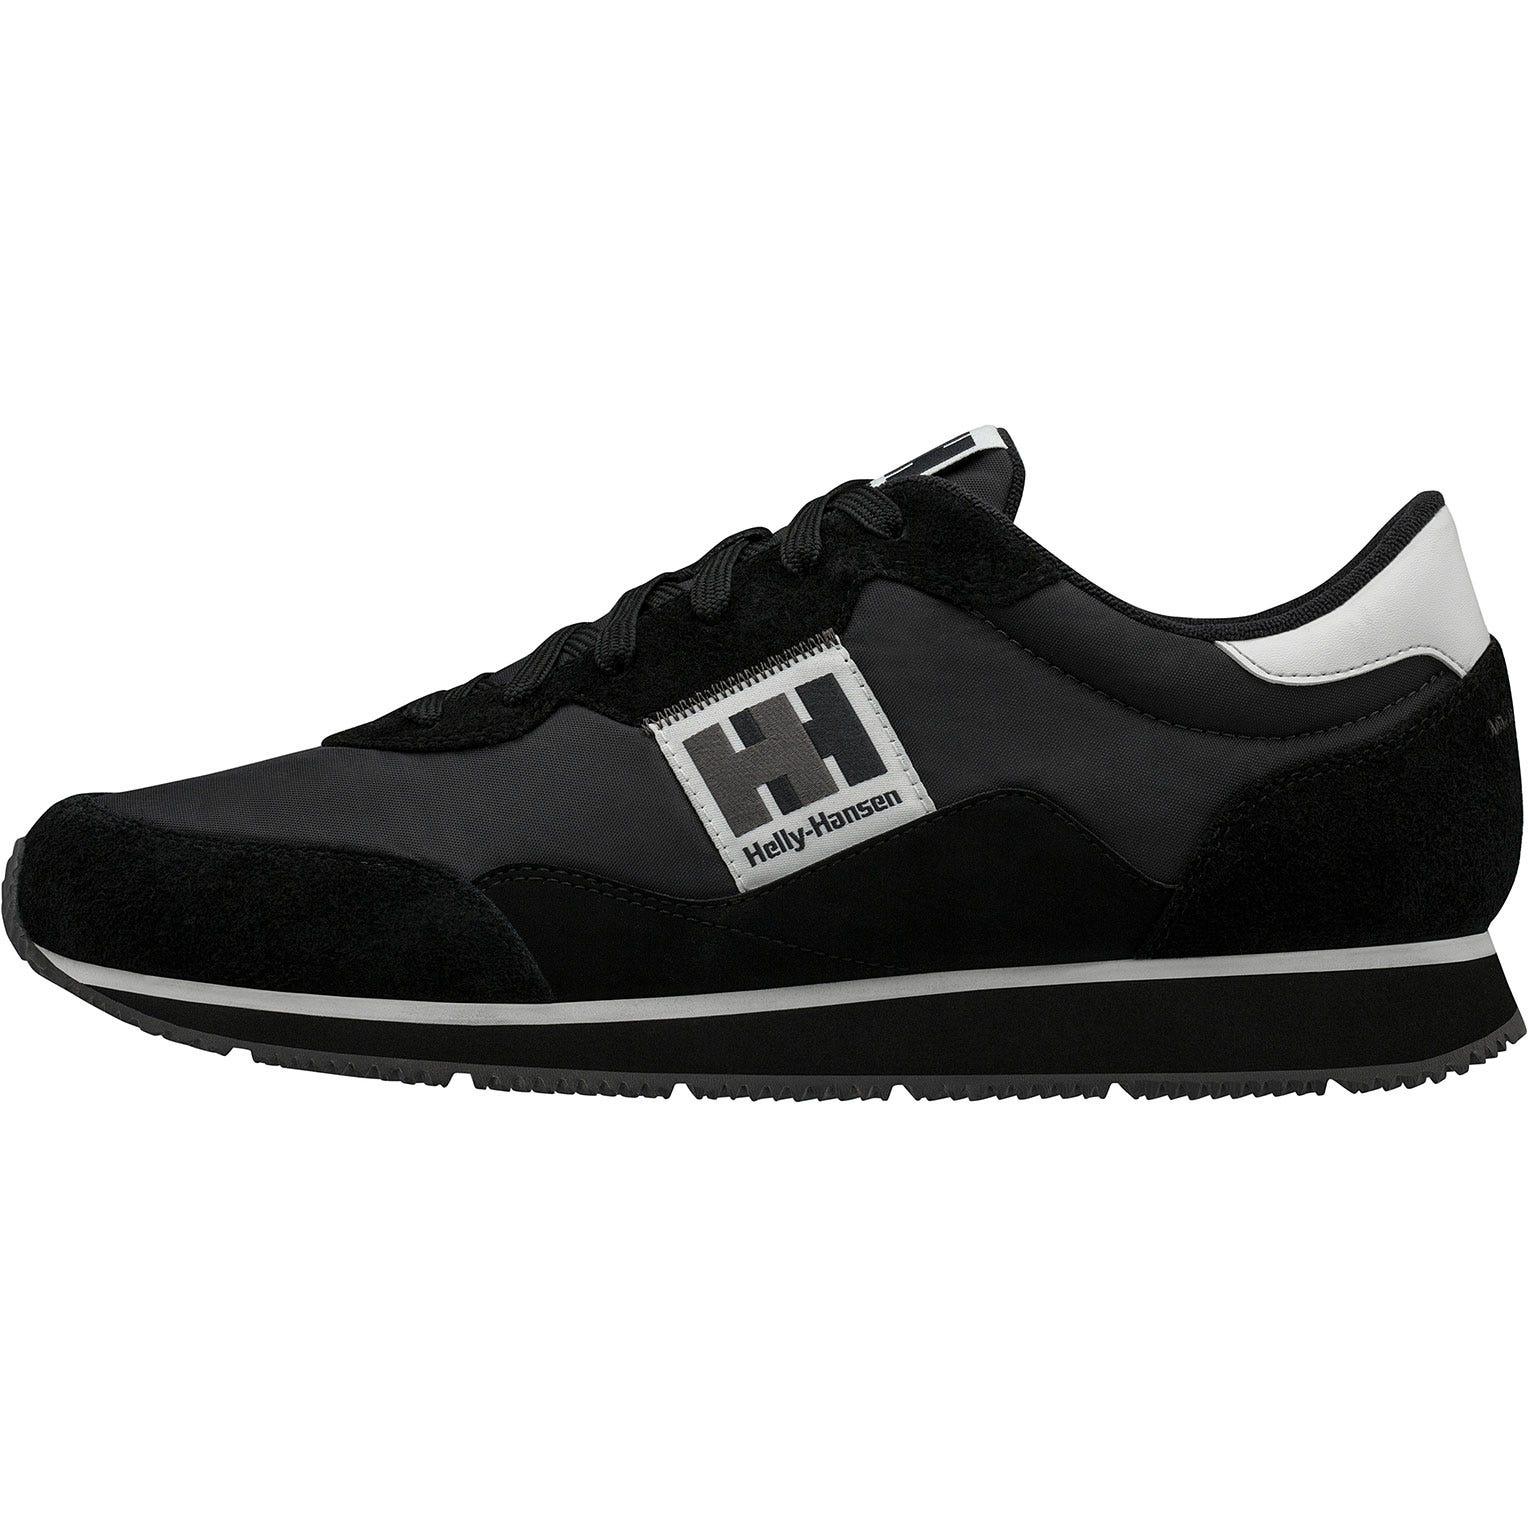 Helly Hansen Ripples Lowcut Sneaker Mens Black 46.5/12